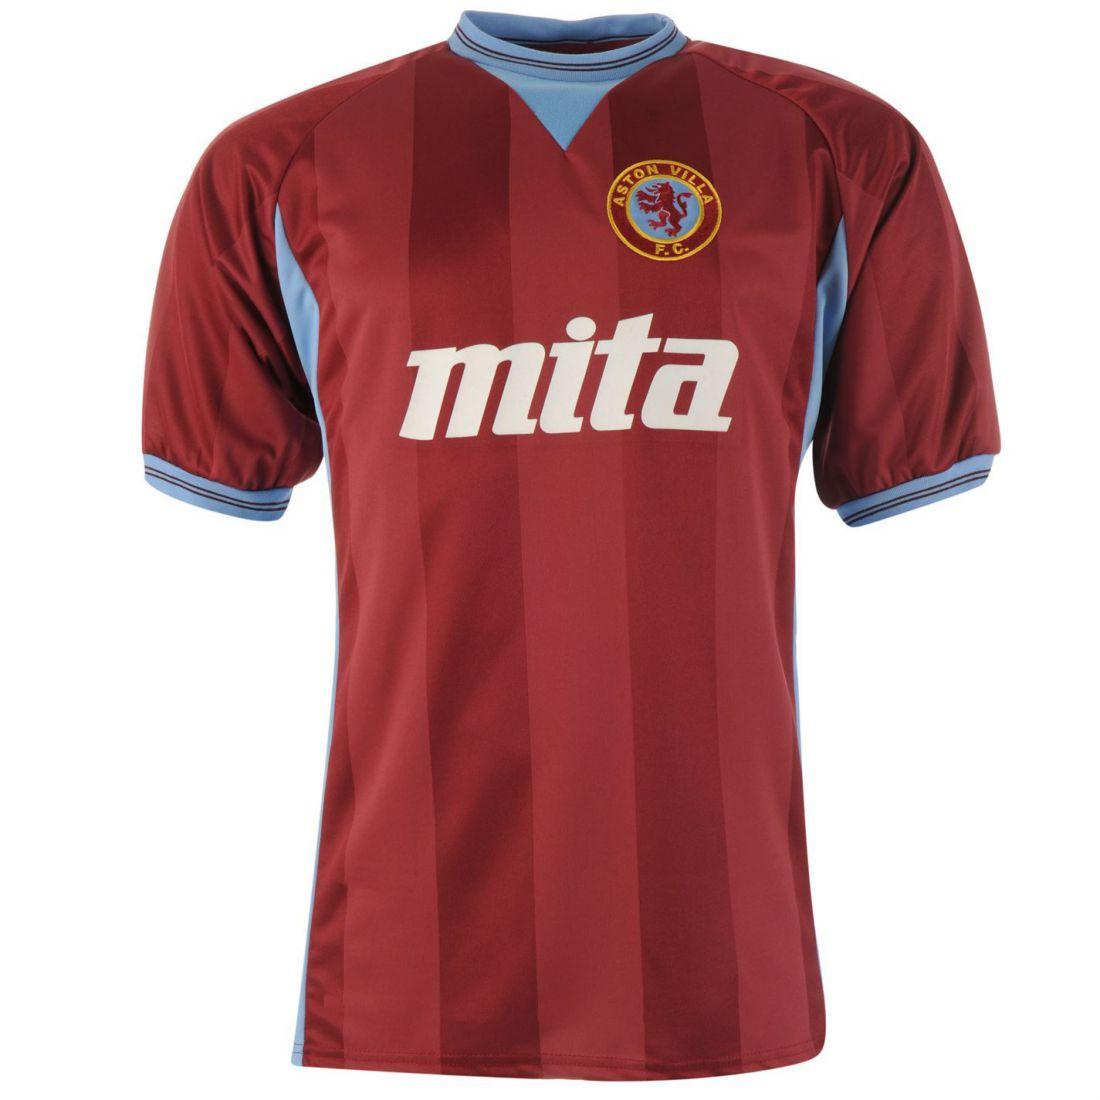 Score Draw Mens Aston Villa Football Club 1984 Home Jersey Retro Shirt Short